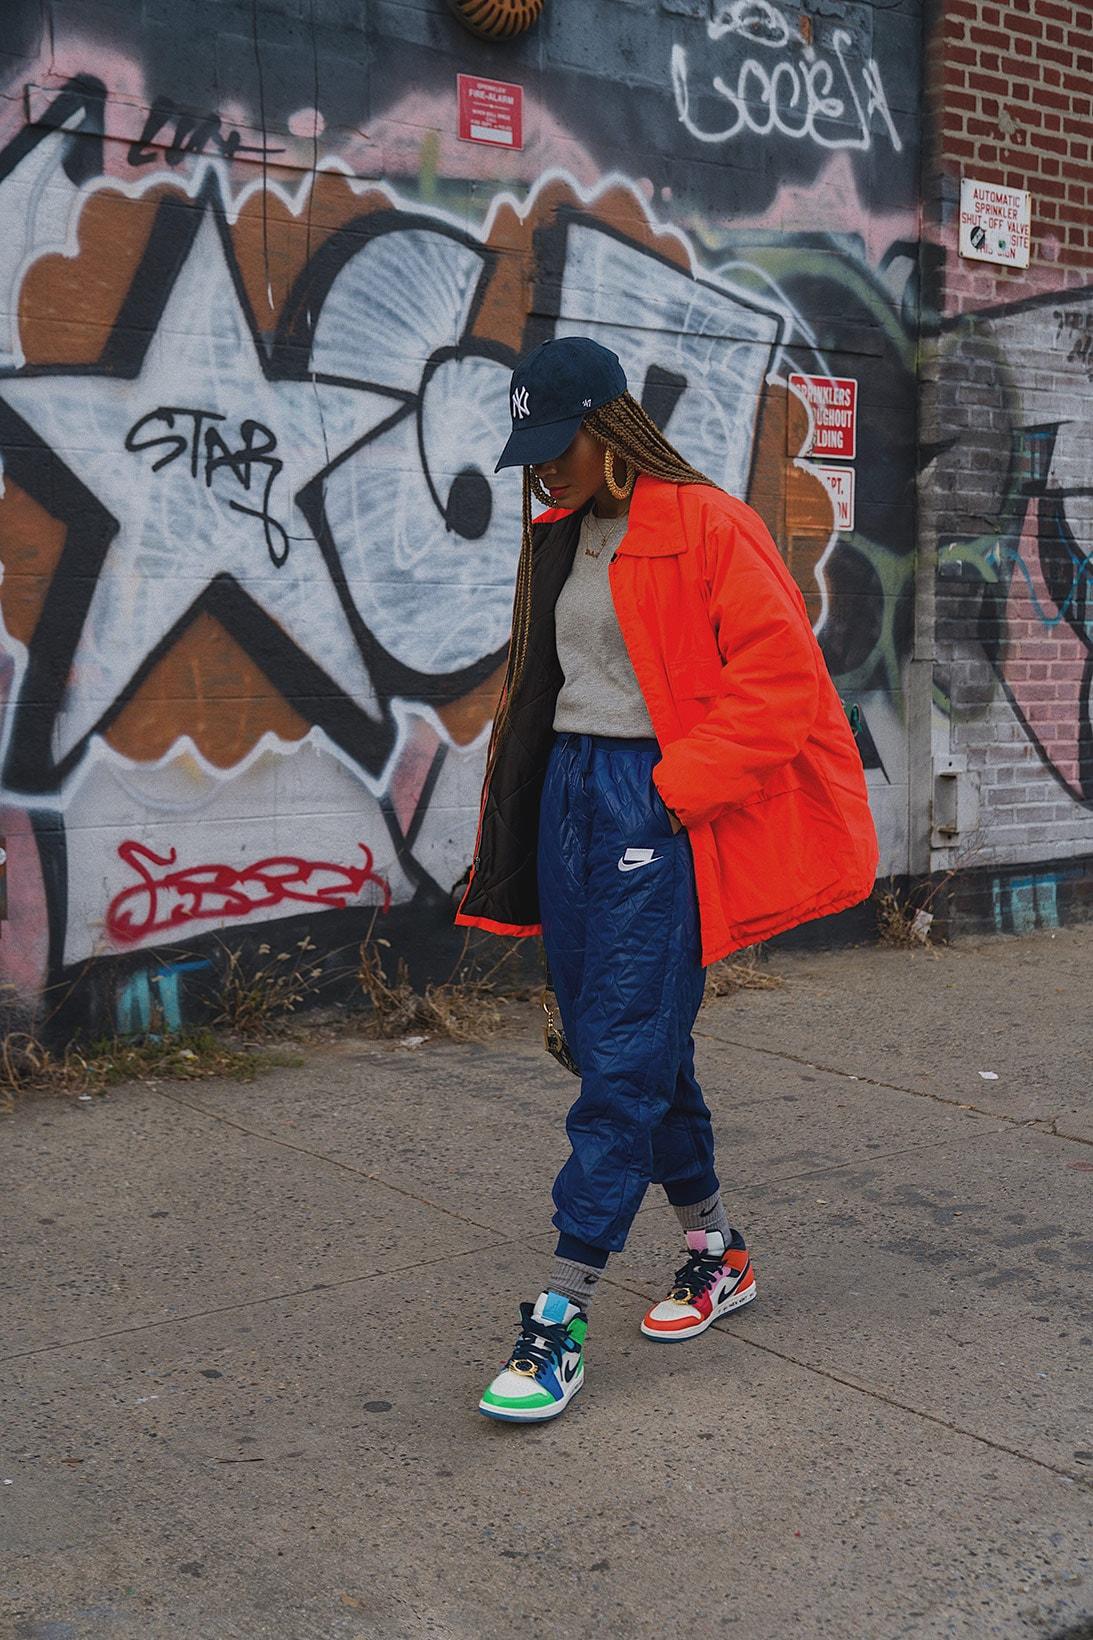 kia marie sneaker collector new york city content creator stylist influencer off white nike jordan 4 sail 1